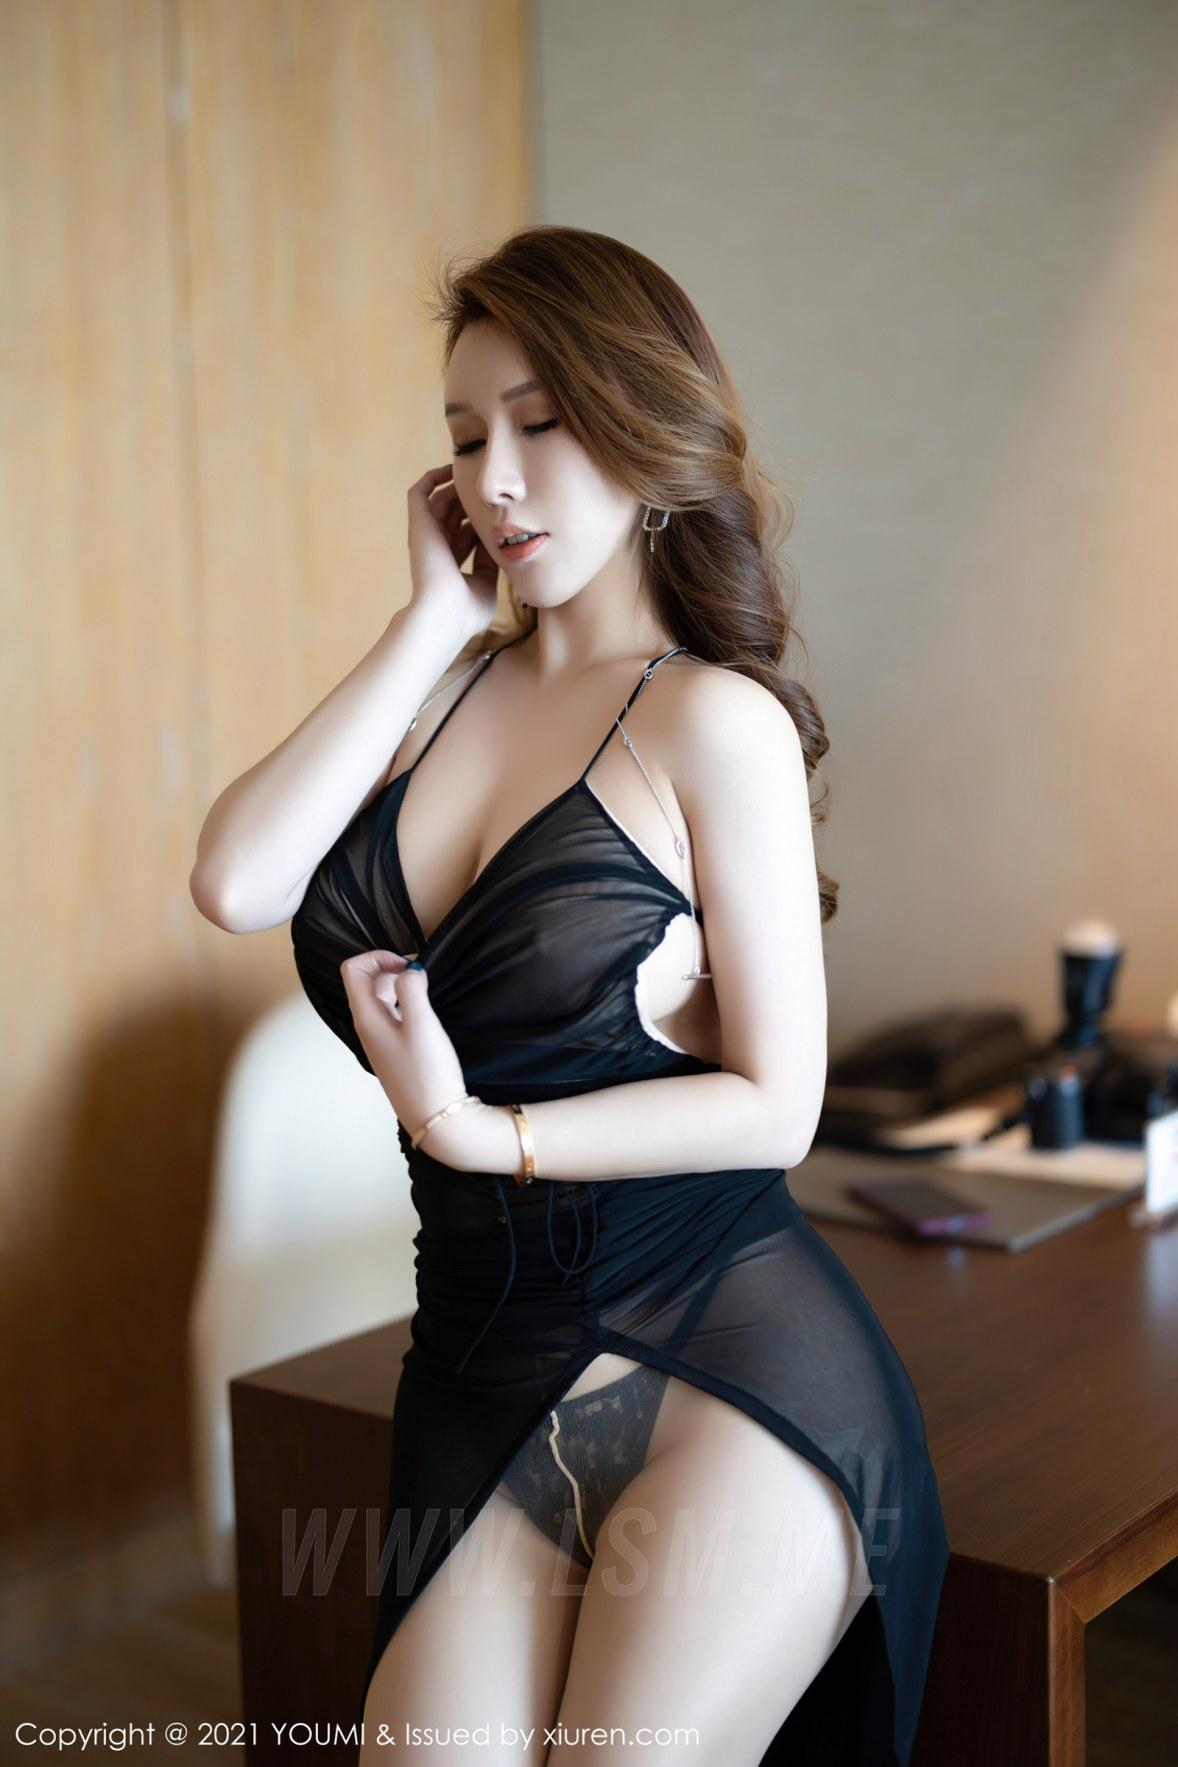 YOUMI 尤蜜荟 Vol.583 熟女翘臀 尤妮丝 薄透魅惑 - 2